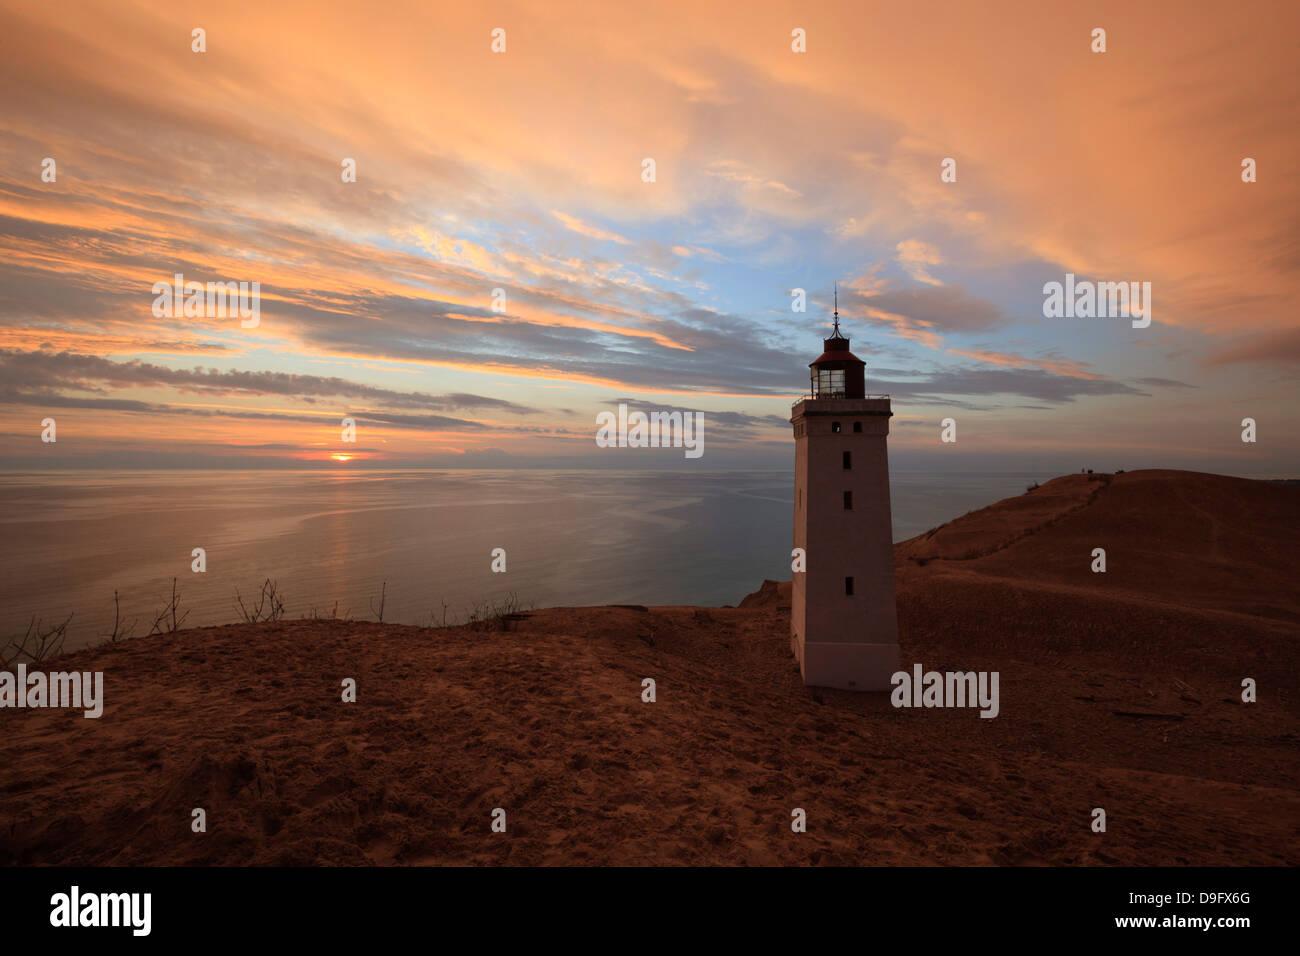 Rubjerg Knude Fyr (lighthouse) buried by sand drift at sunset, Lokken, Jutland, Denmark, Scandinavia - Stock Image